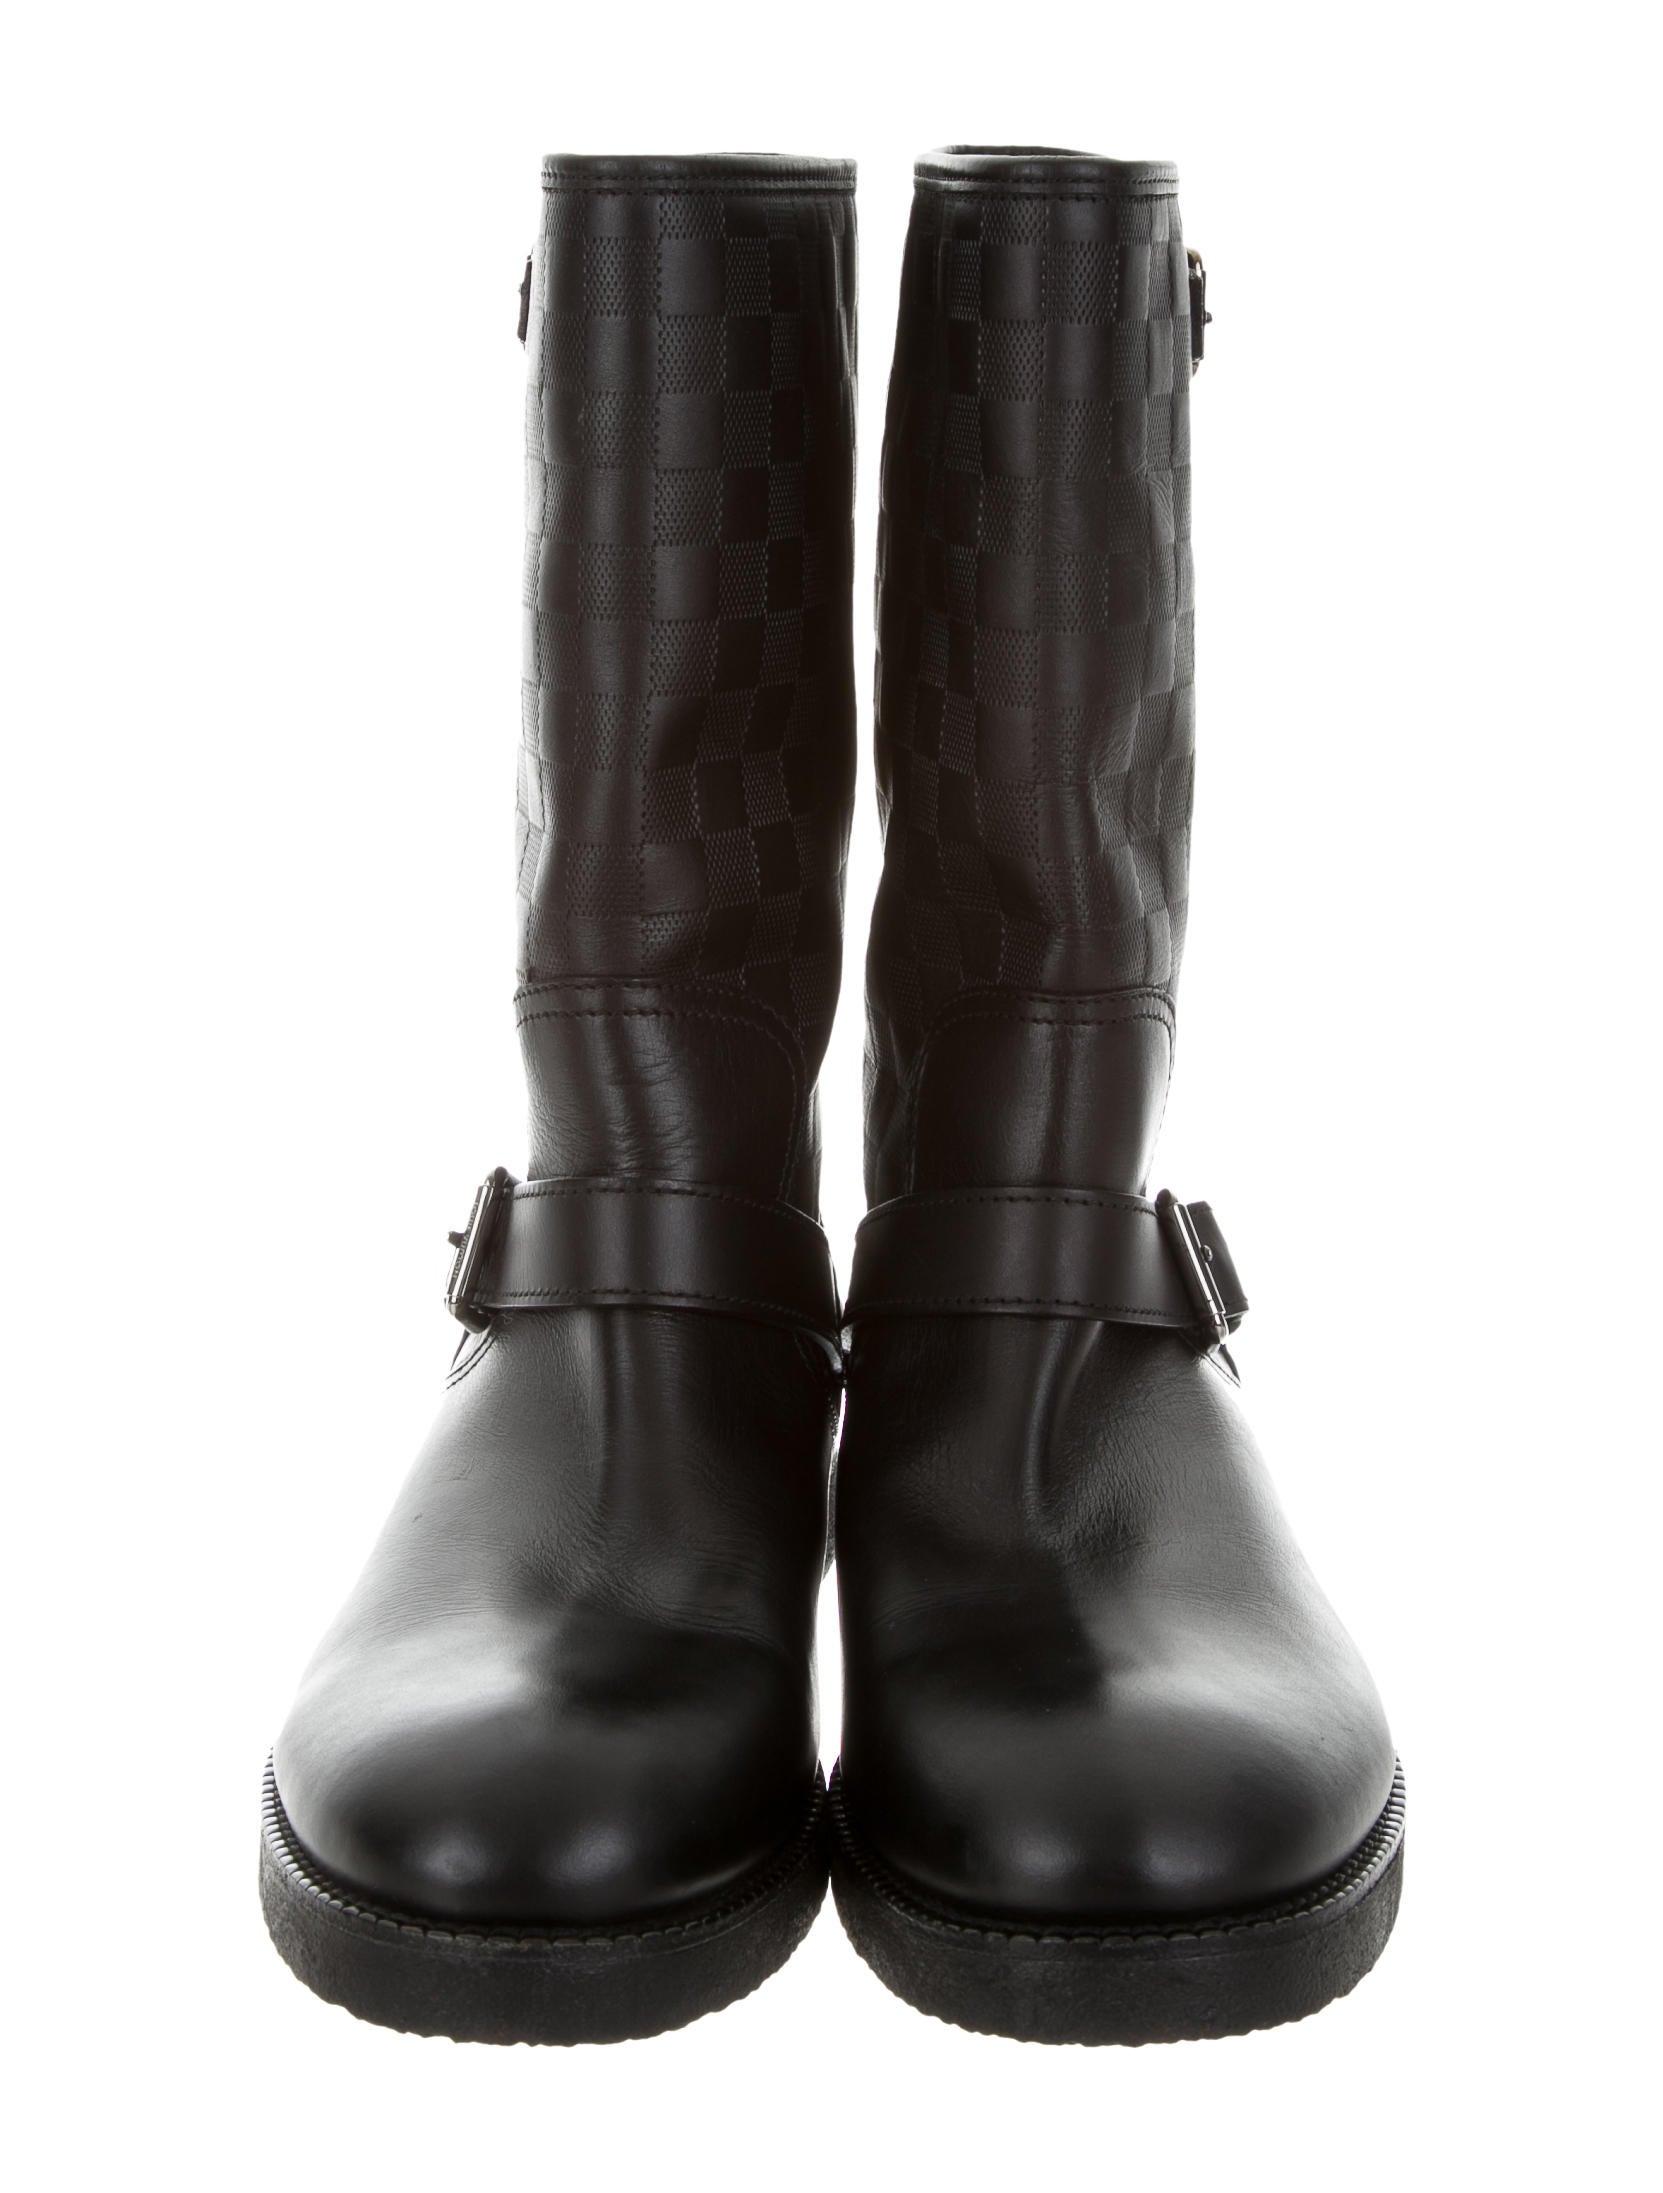 e7e169c3dbc Louis Vuitton Backfire Damier Boots - Shoes - LOU112134 .